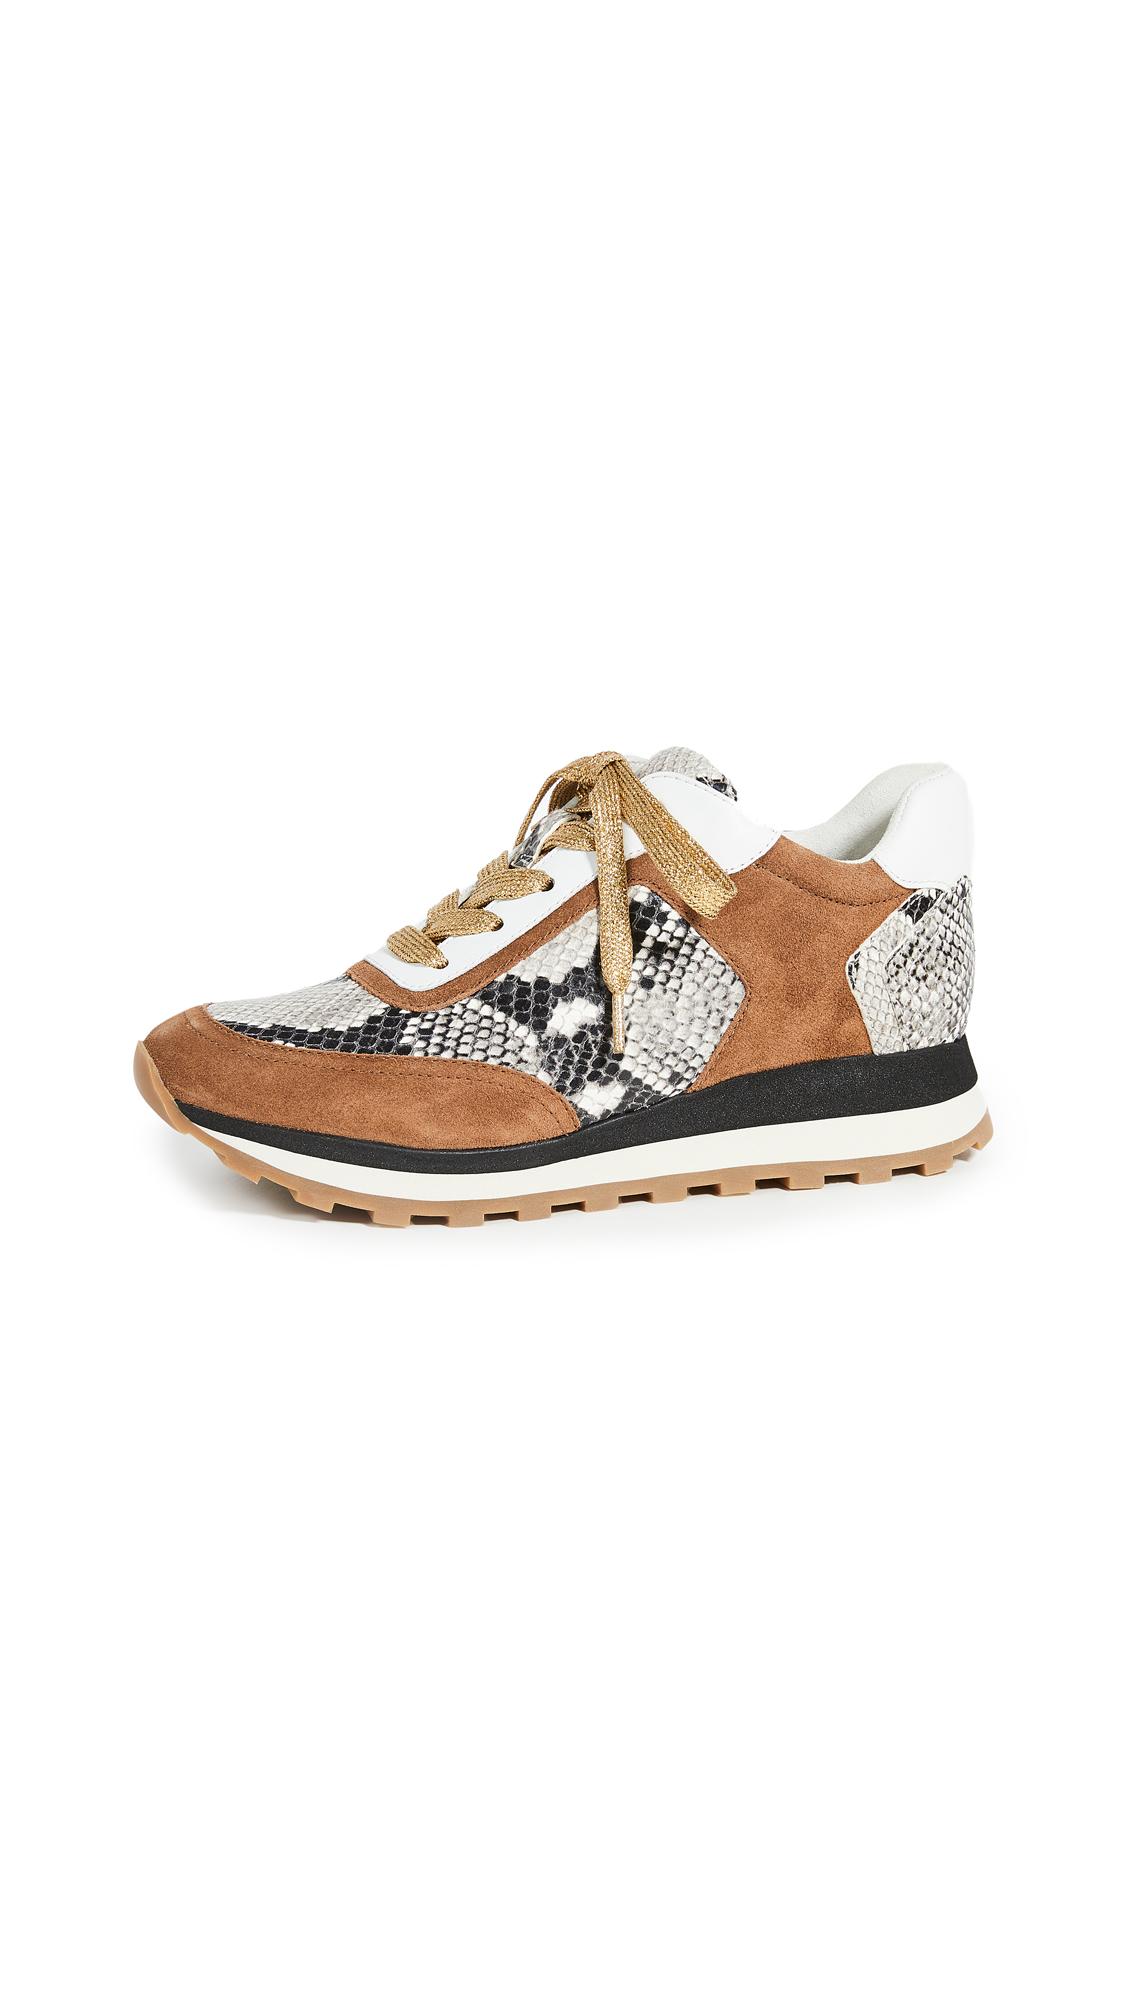 Veronica Beard Hartley Sneakers